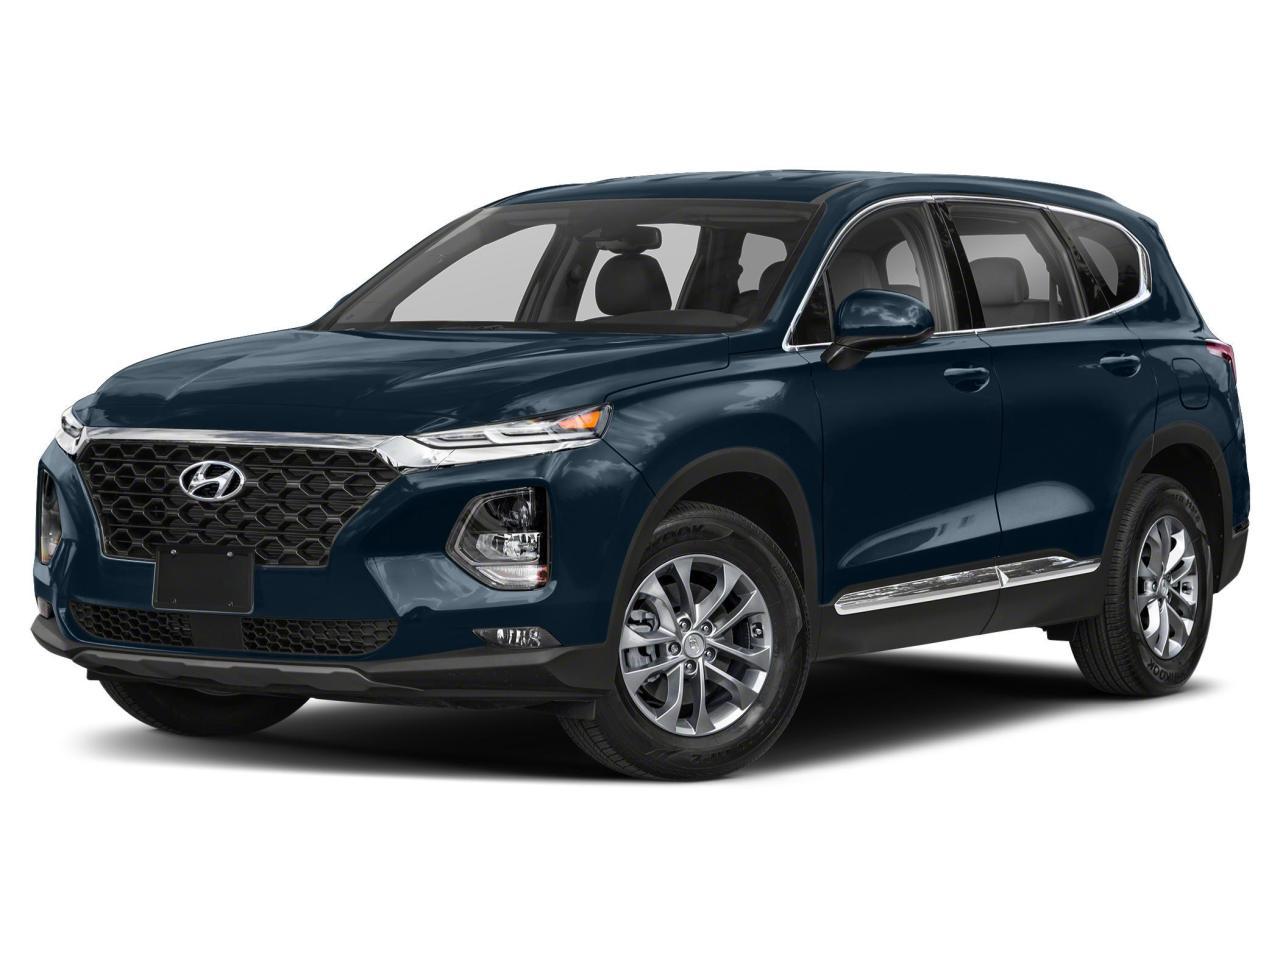 2020 Hyundai Santa Fe 2.4L Preferred AWD SUN AND LEATHER